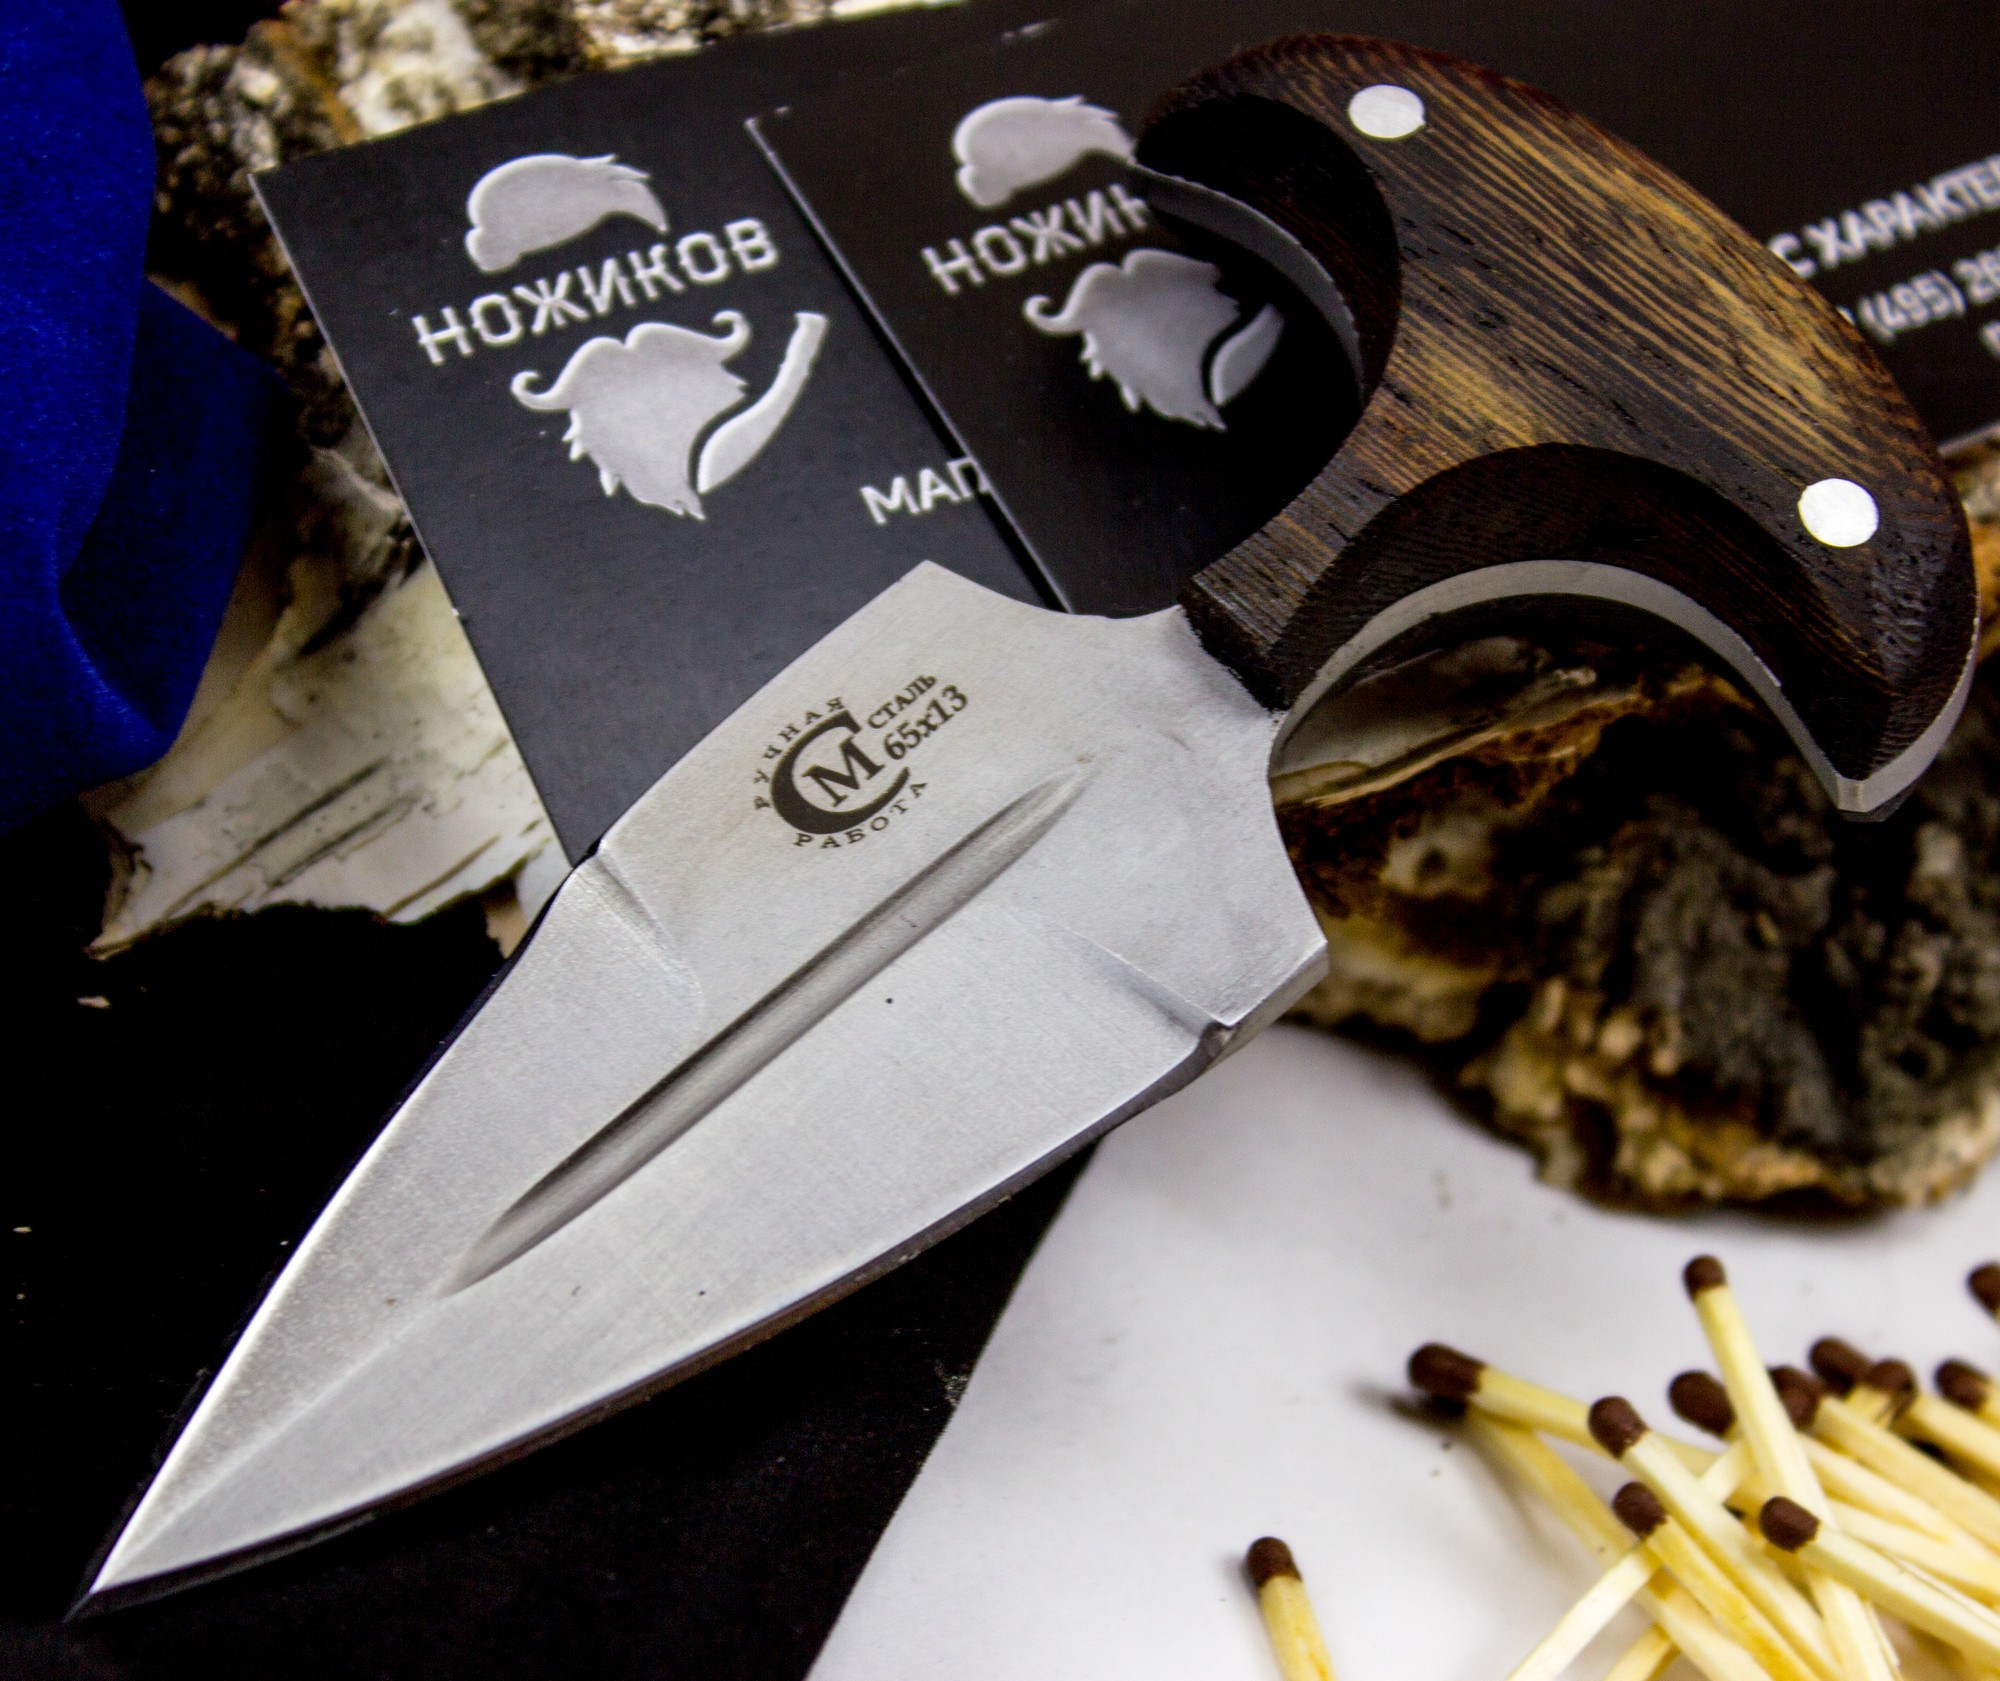 Фото 5 - Нож тычковый Пиранья, сталь 65Х13 от Кузница Семина